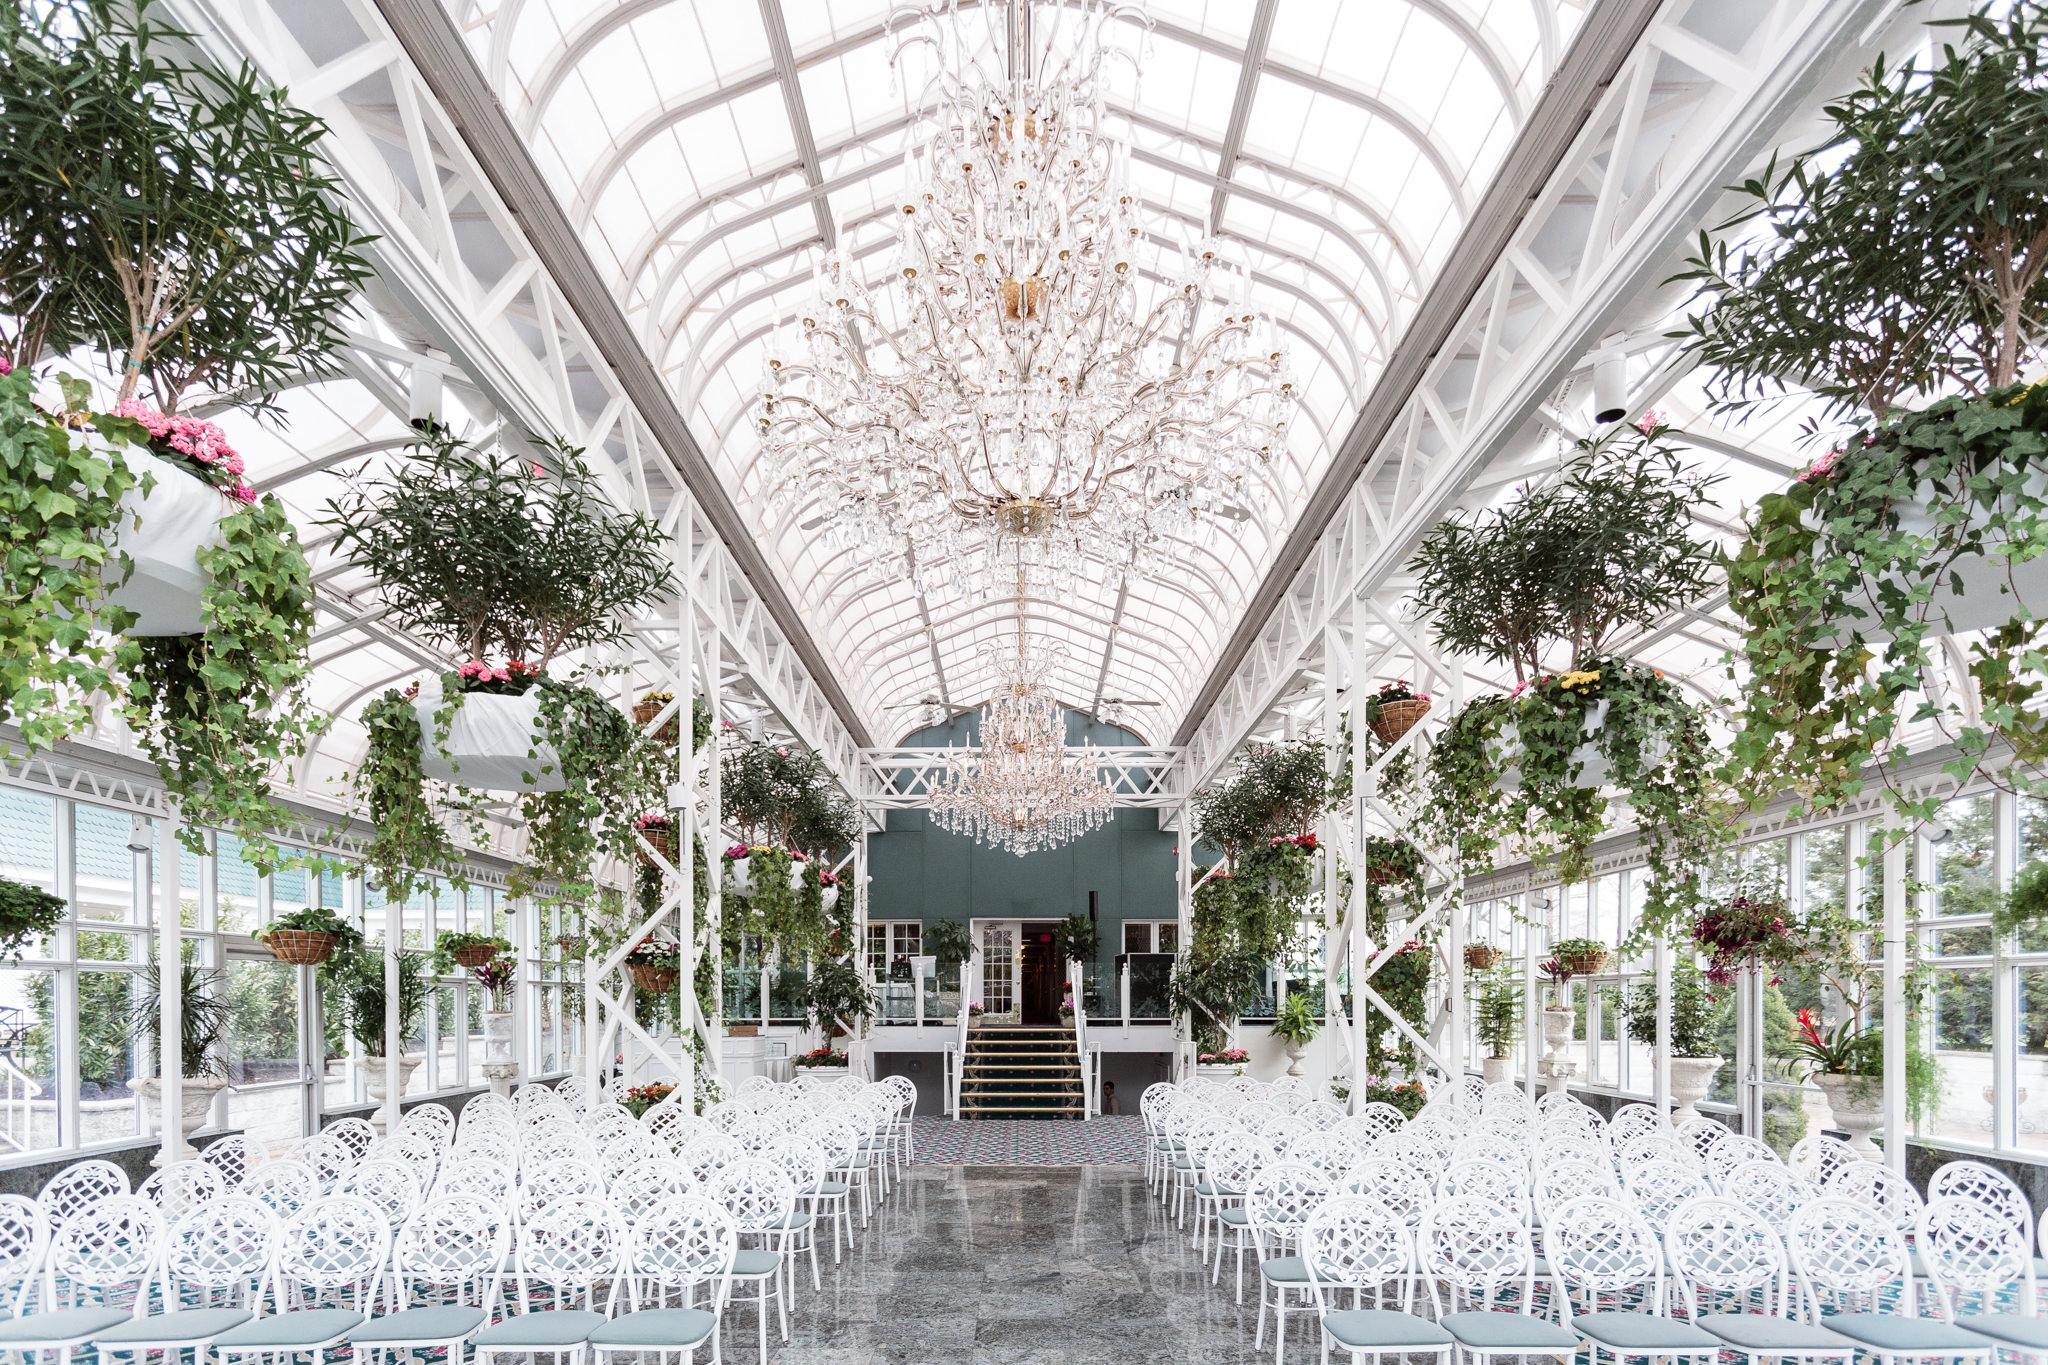 Hanchar_Madison_Hotel_NJ_Wedding_2C0A7371.jpg